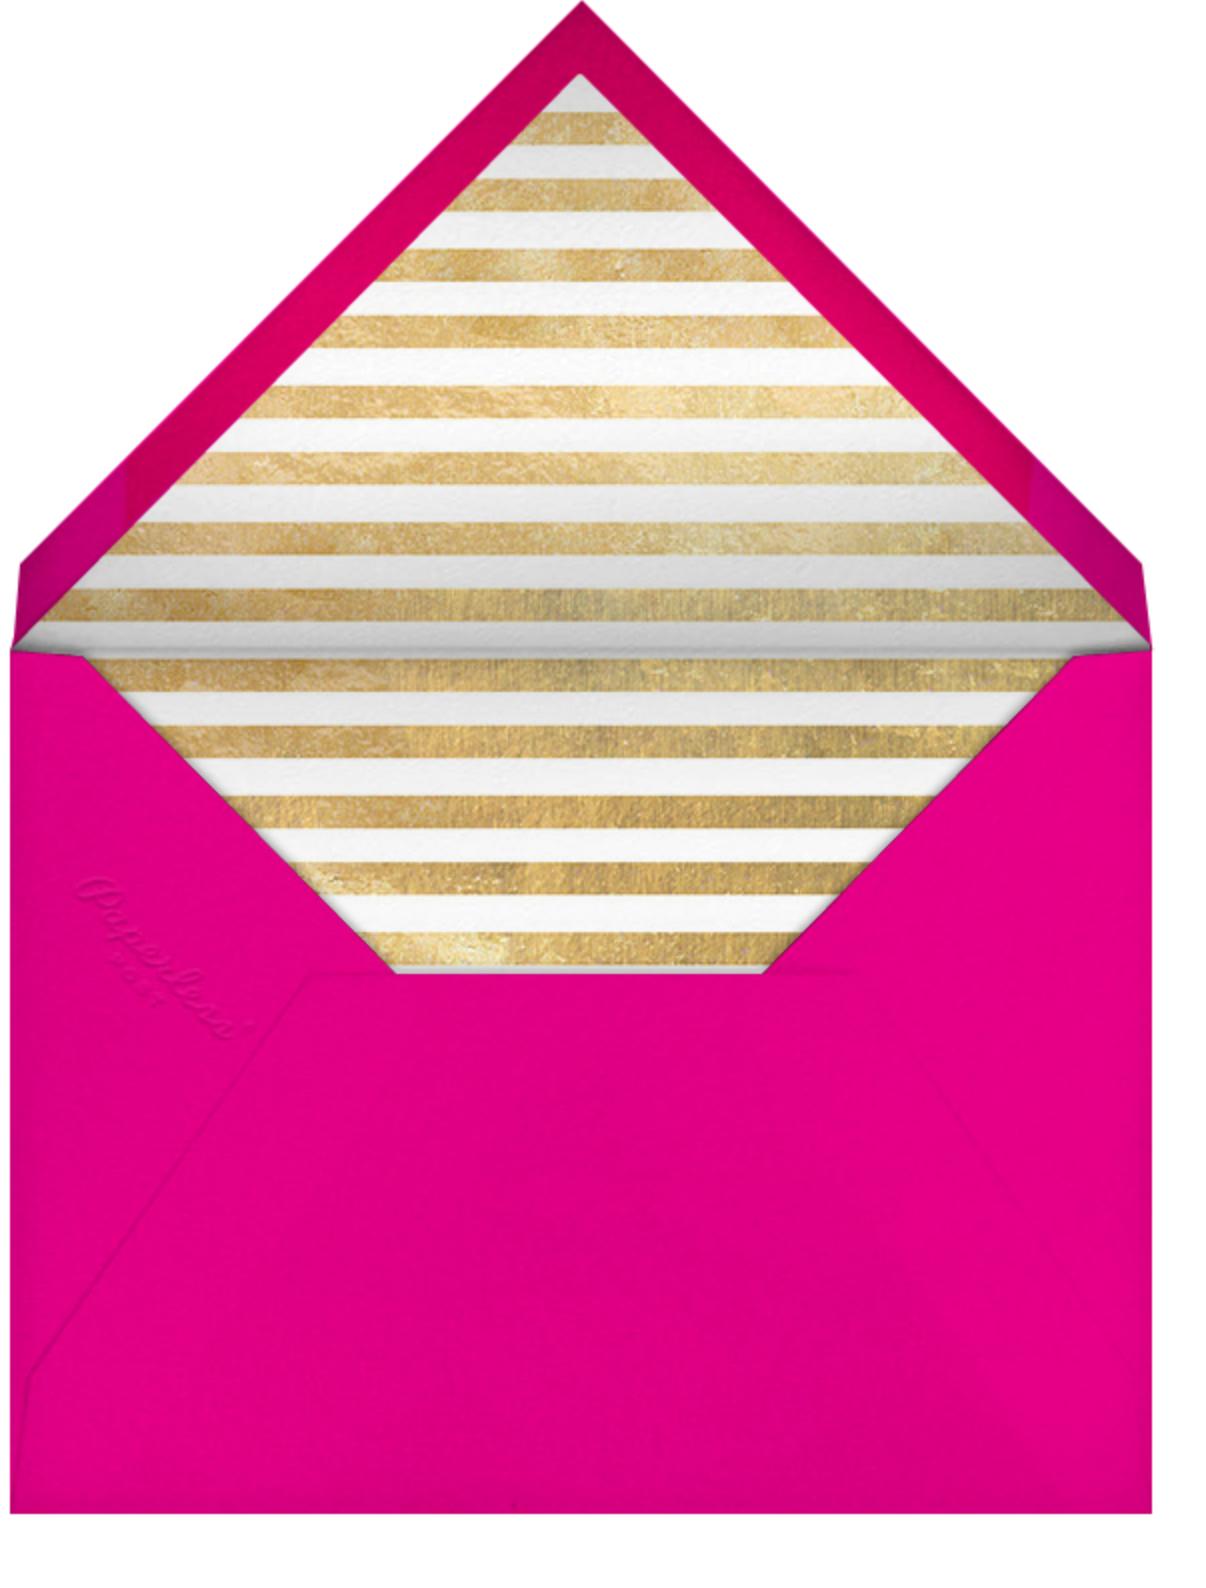 Floral Punch - kate spade new york - Printable invitations - envelope back